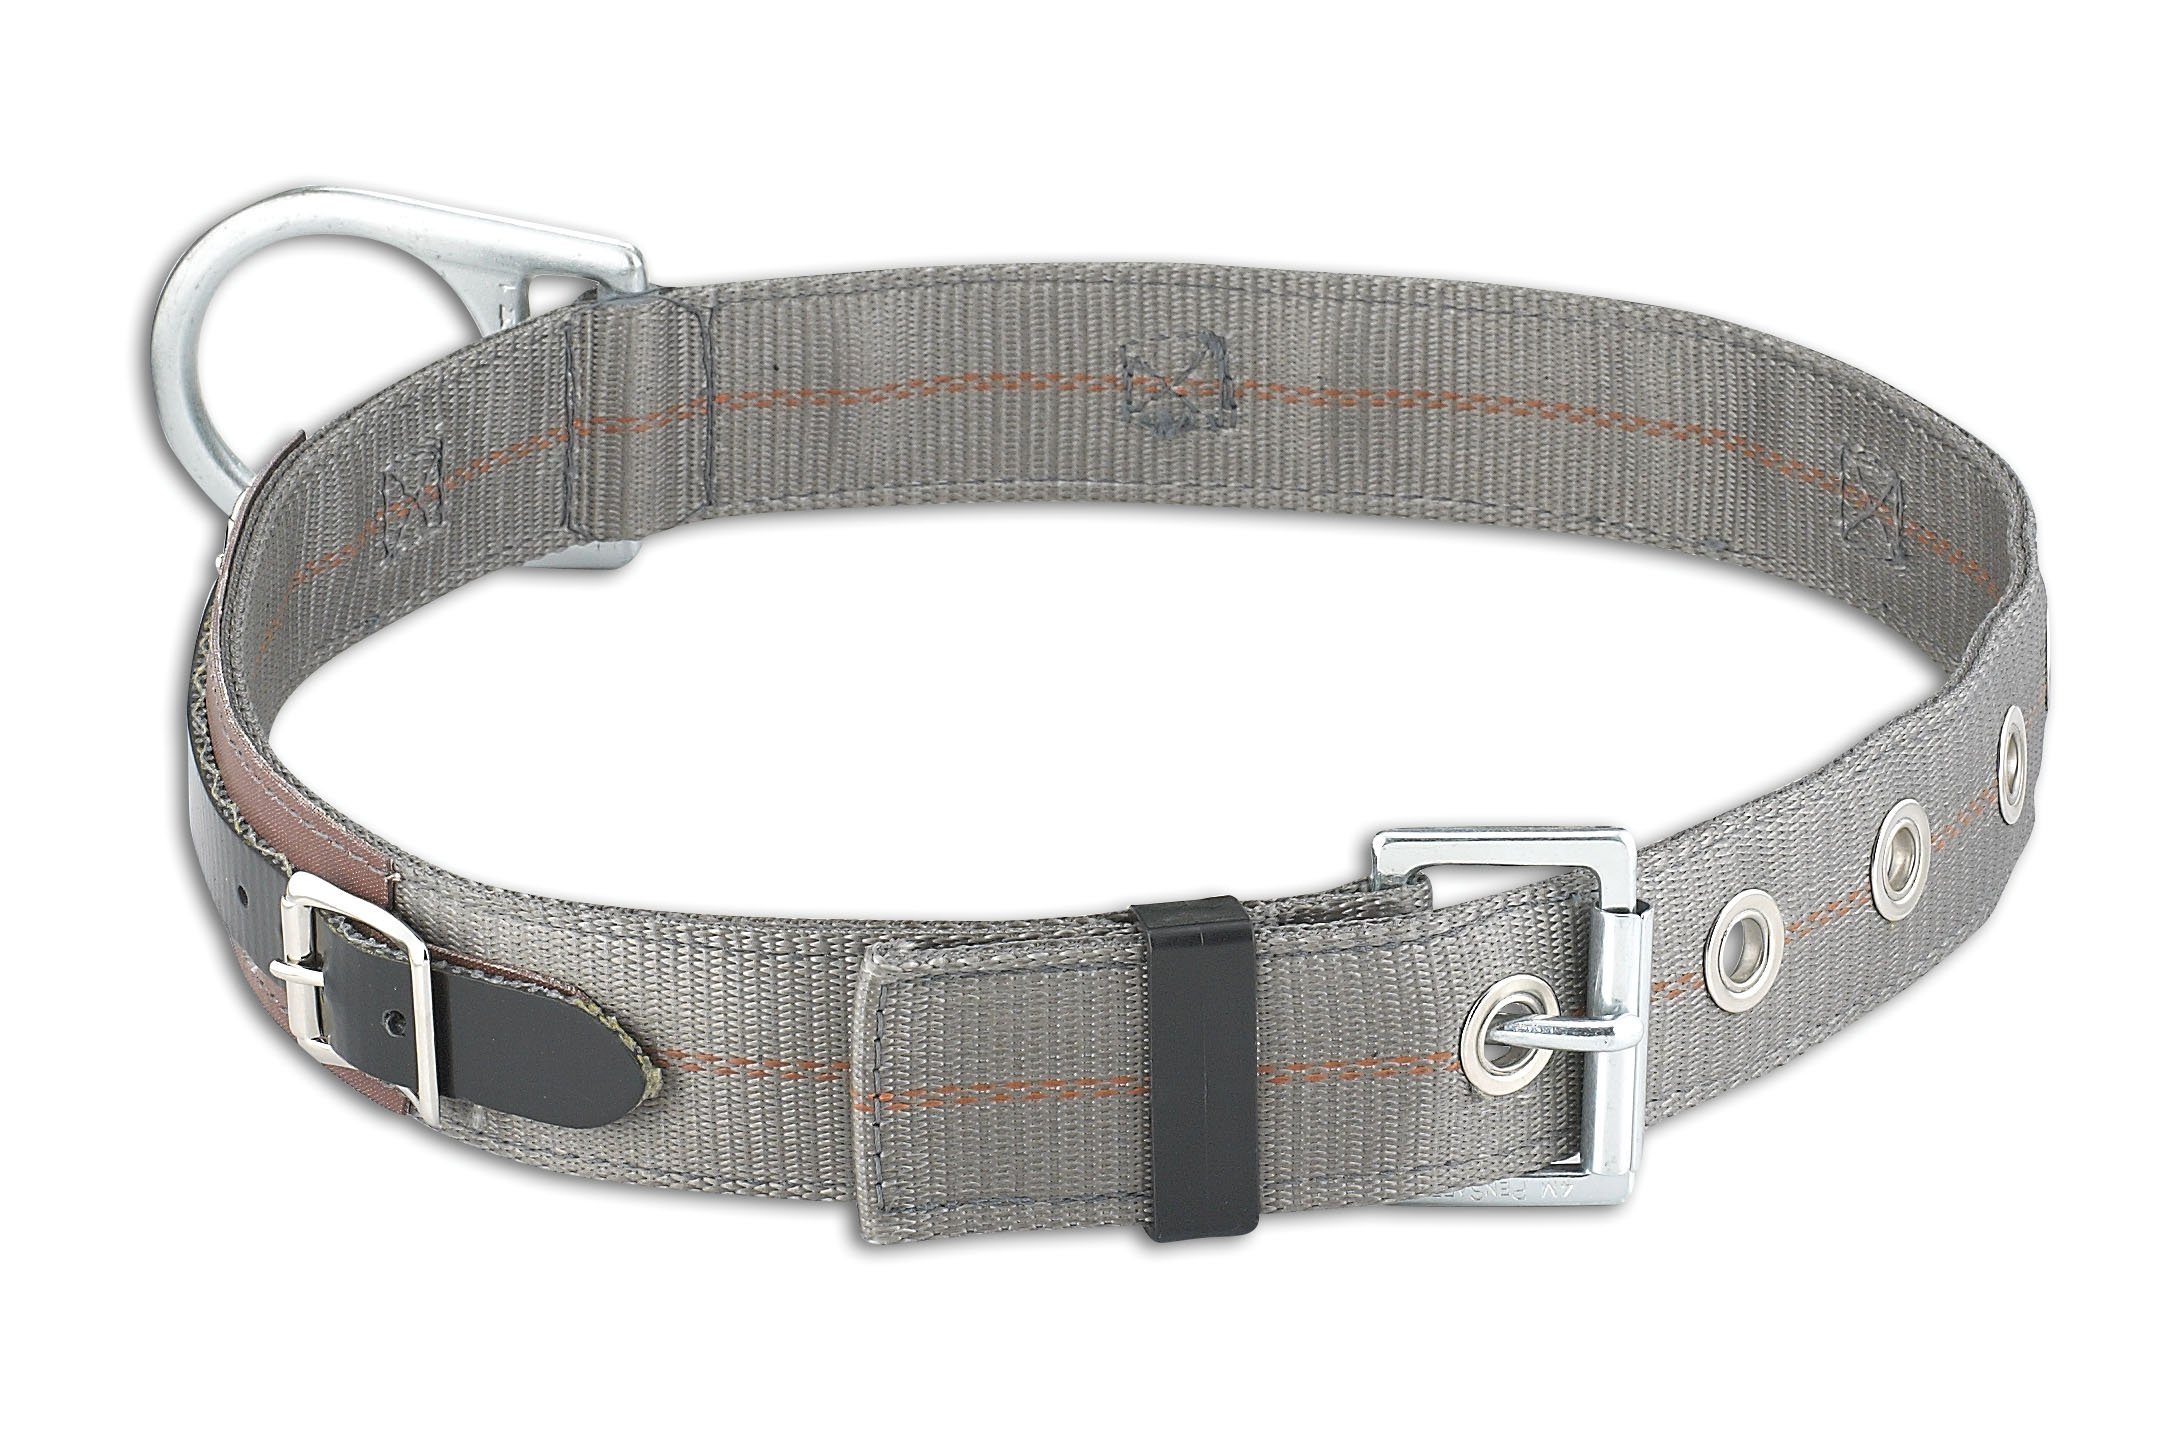 Dynamic Safety FP51001D/M 2 in Miner's Belt, Medium